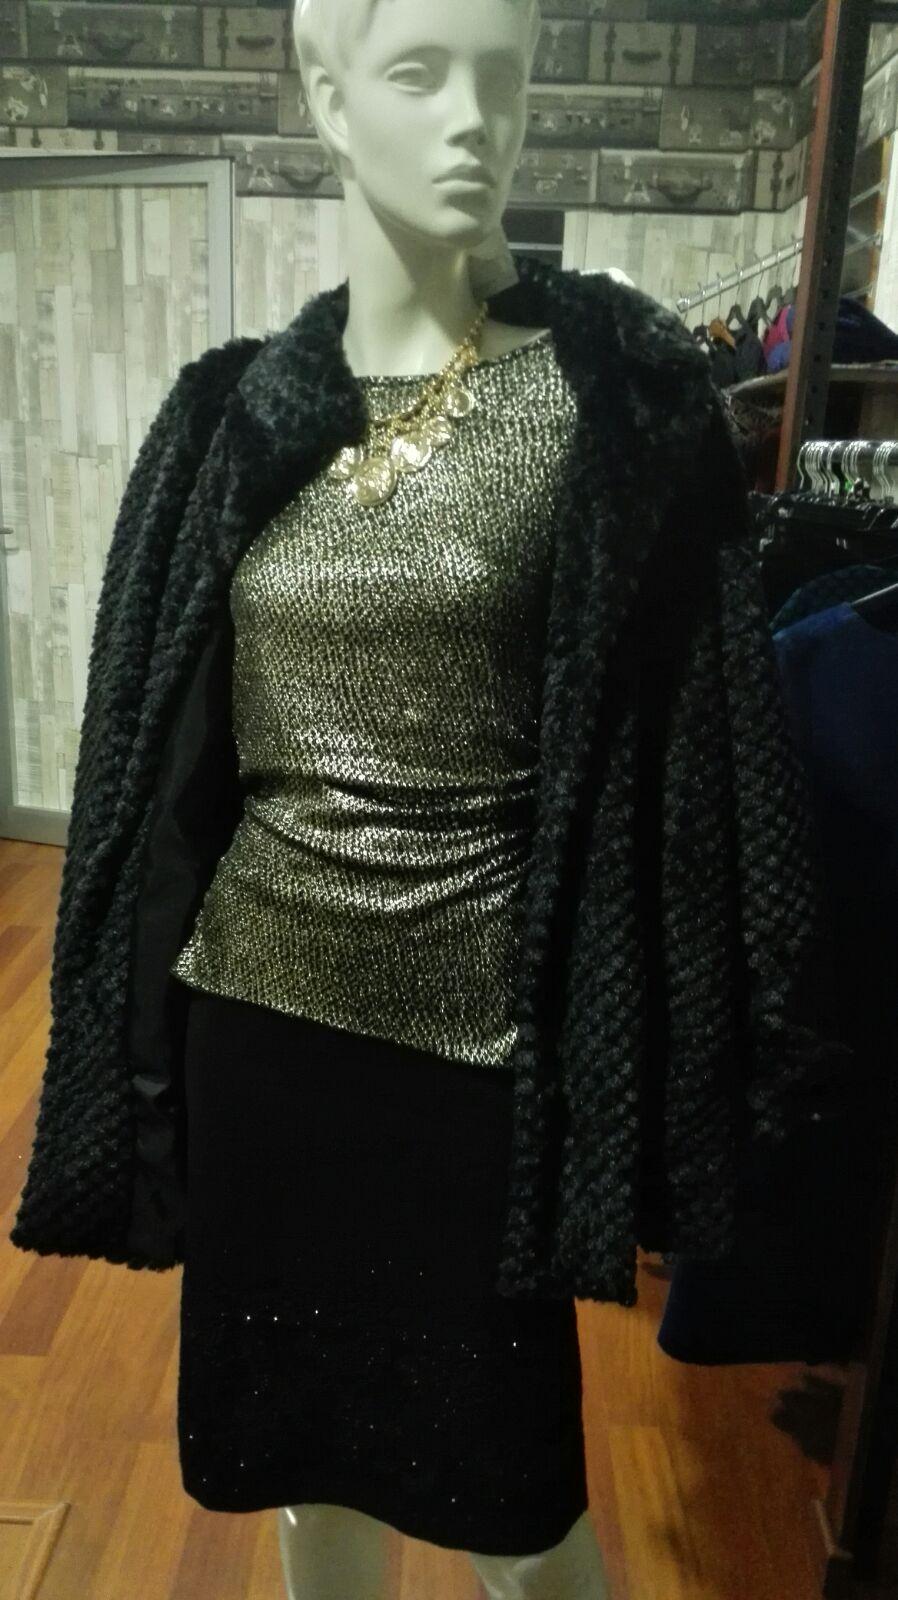 moda almendralejo mujer Mayo Woman